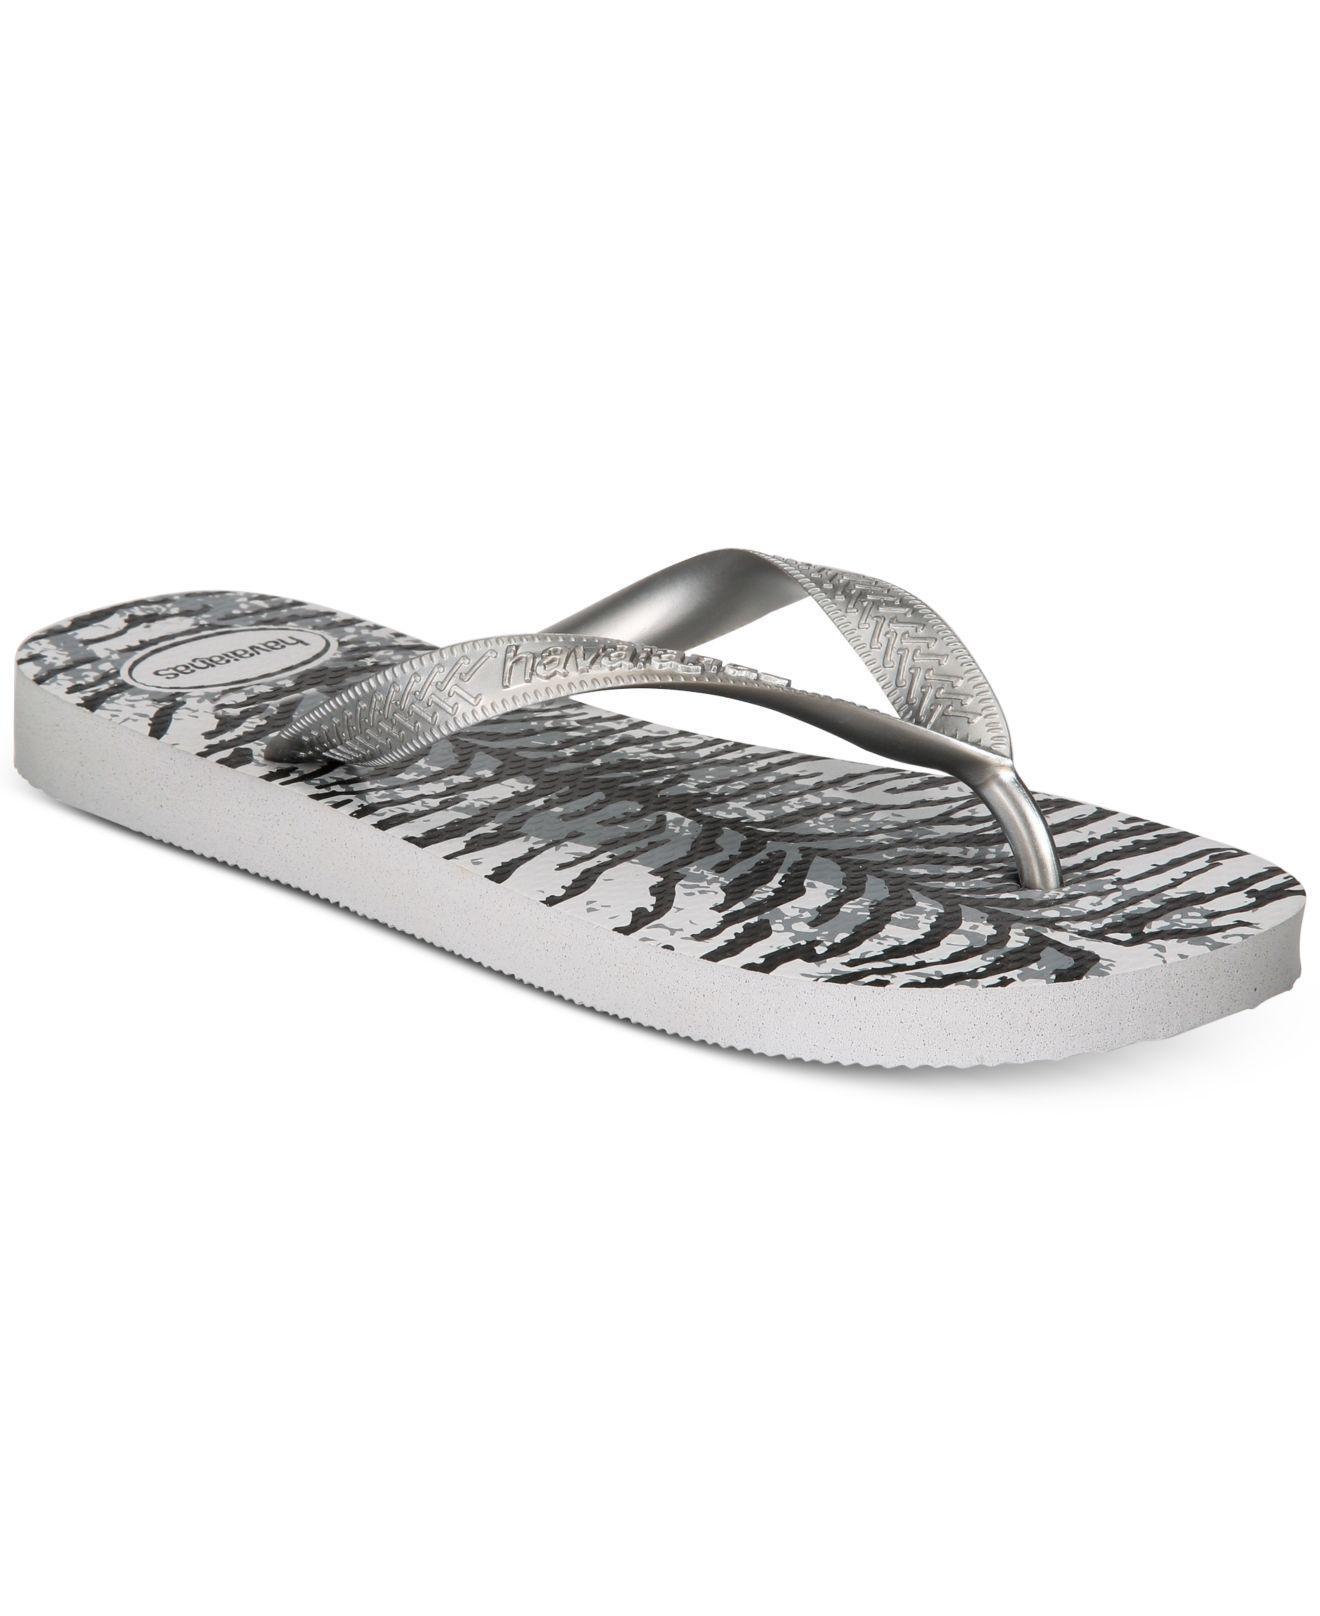 0de9b387be2e Havaianas. Women s Gray Top Animal Flip-flop Sandals ...